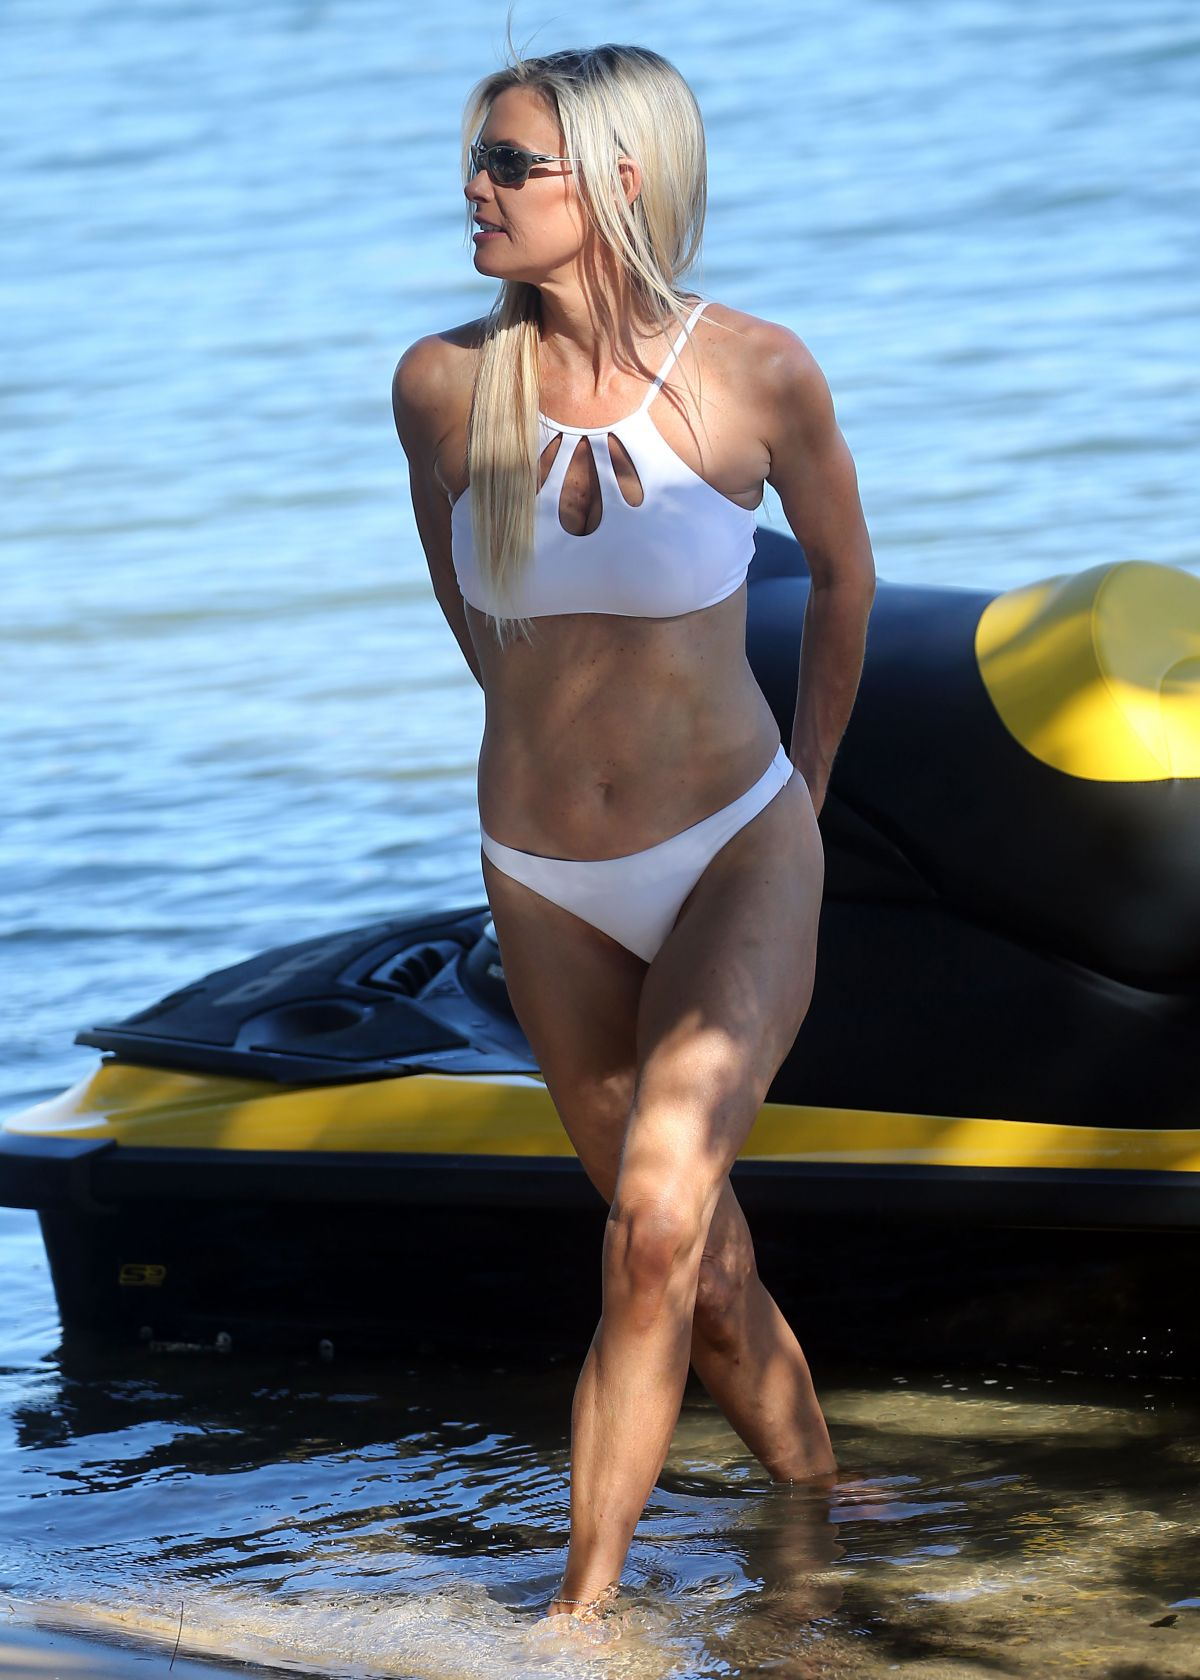 Emma Harrison naked (41 photos), Pussy, Bikini, Boobs, in bikini 2018